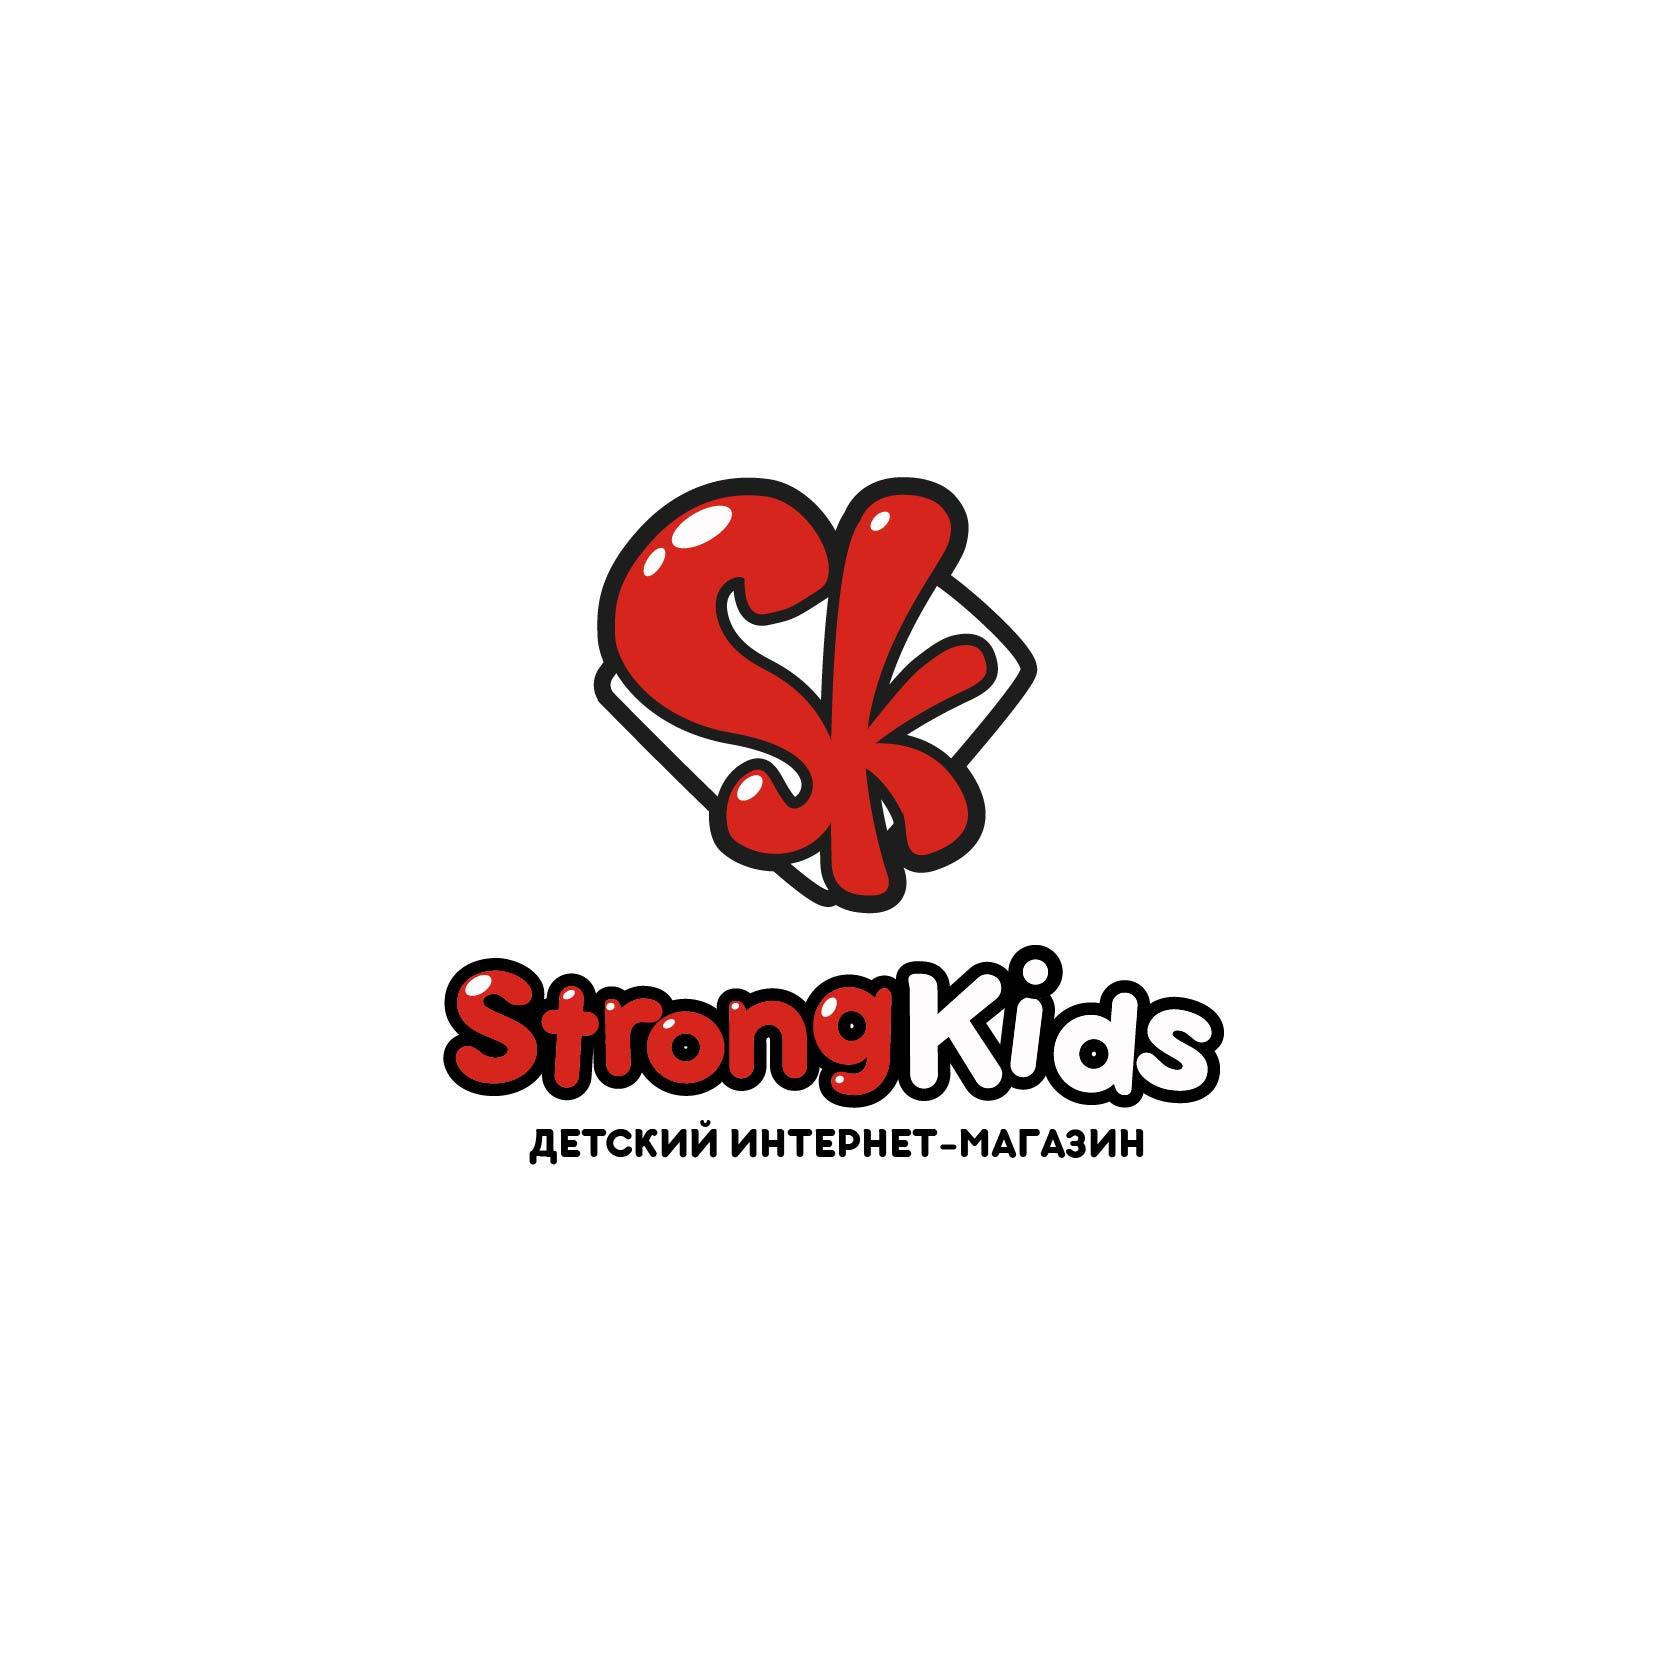 Логотип для Детского Интернет Магазина StrongKids фото f_4525c7fb6b6f1e56.jpg